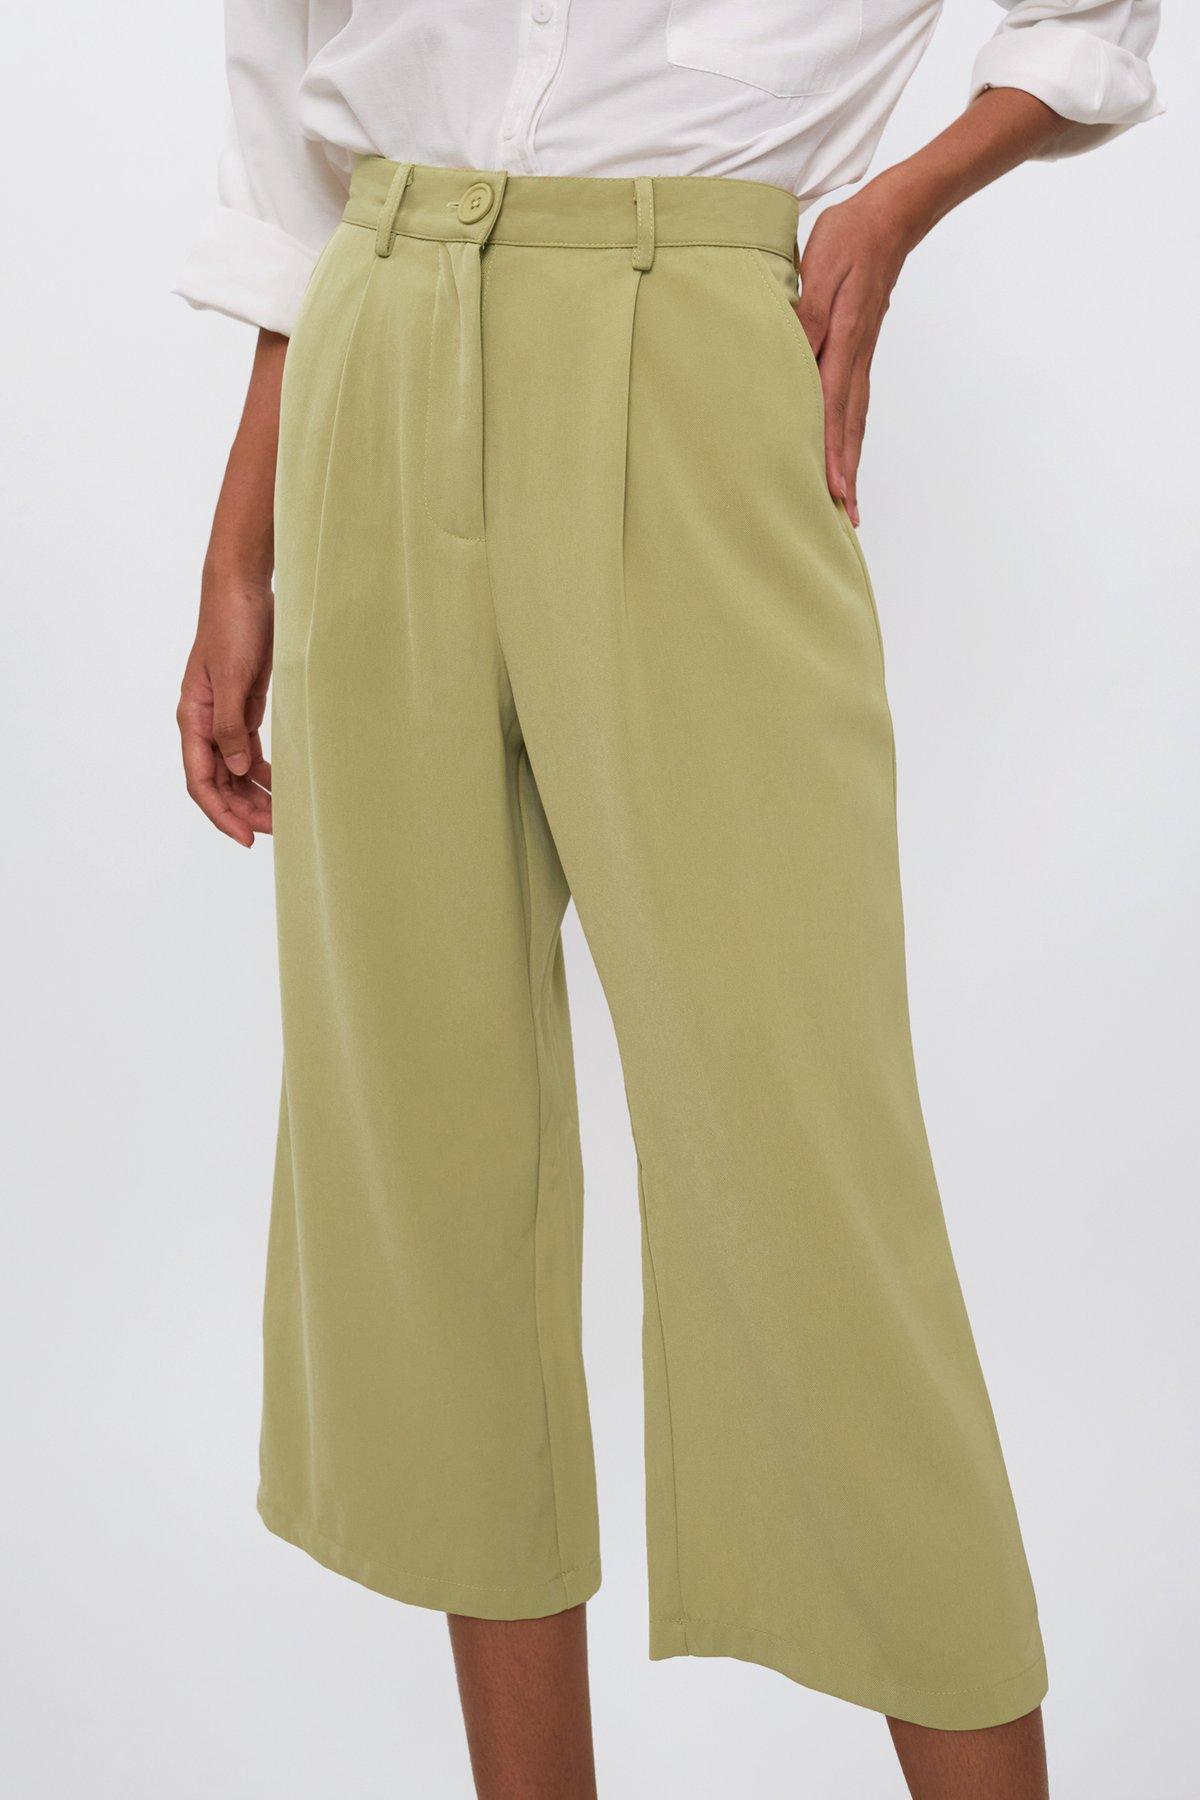 Clan Straight Leg Culottes (Avocado)